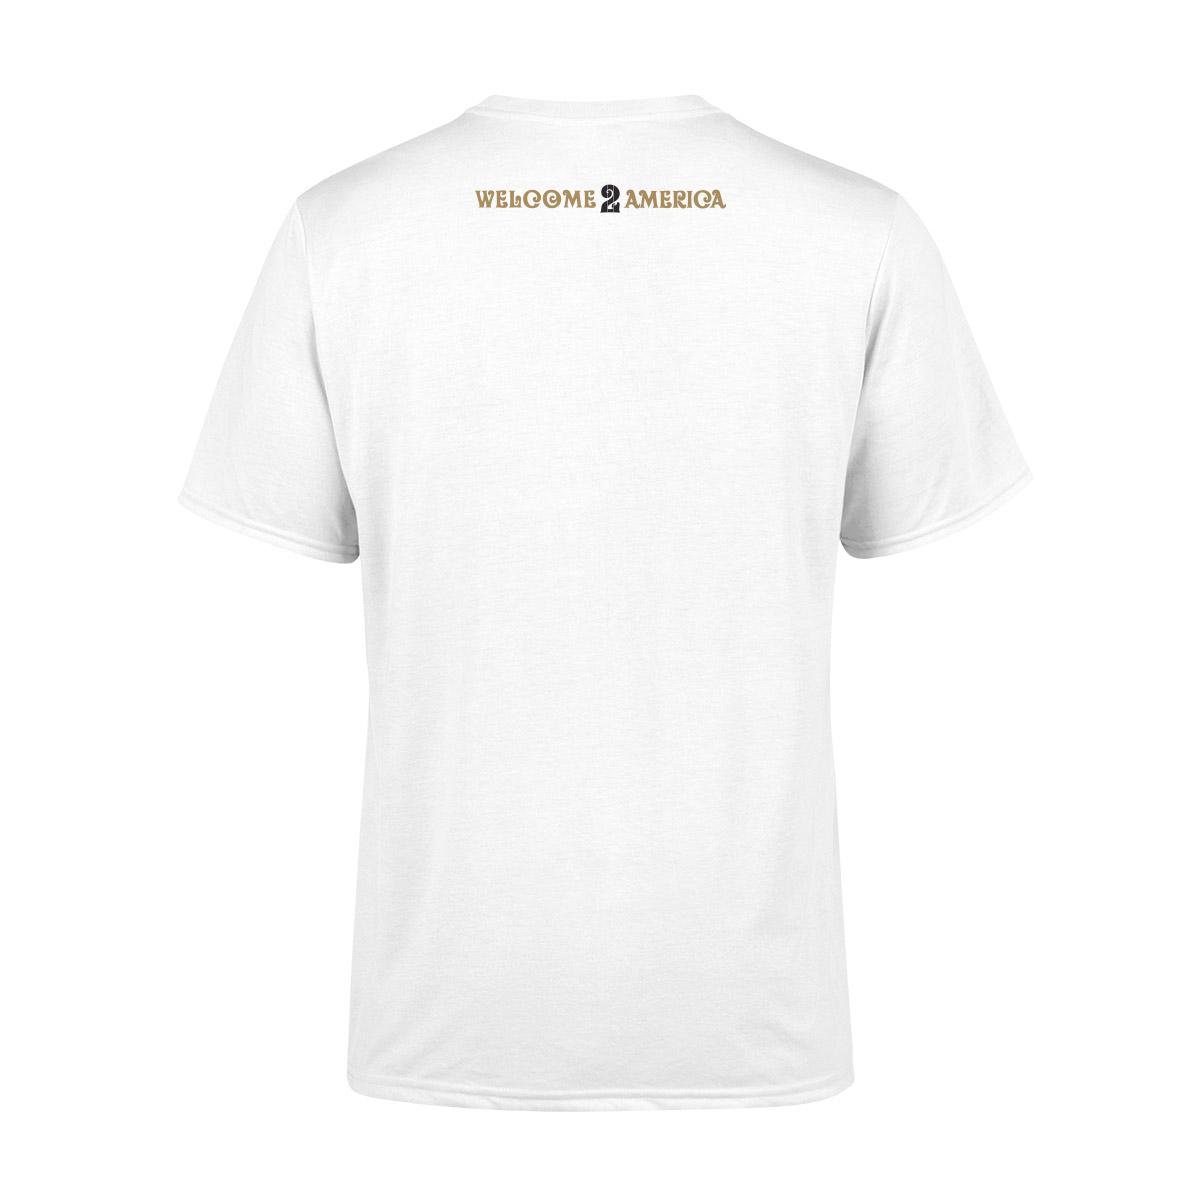 Welcome 2 America Lyric T-shirt